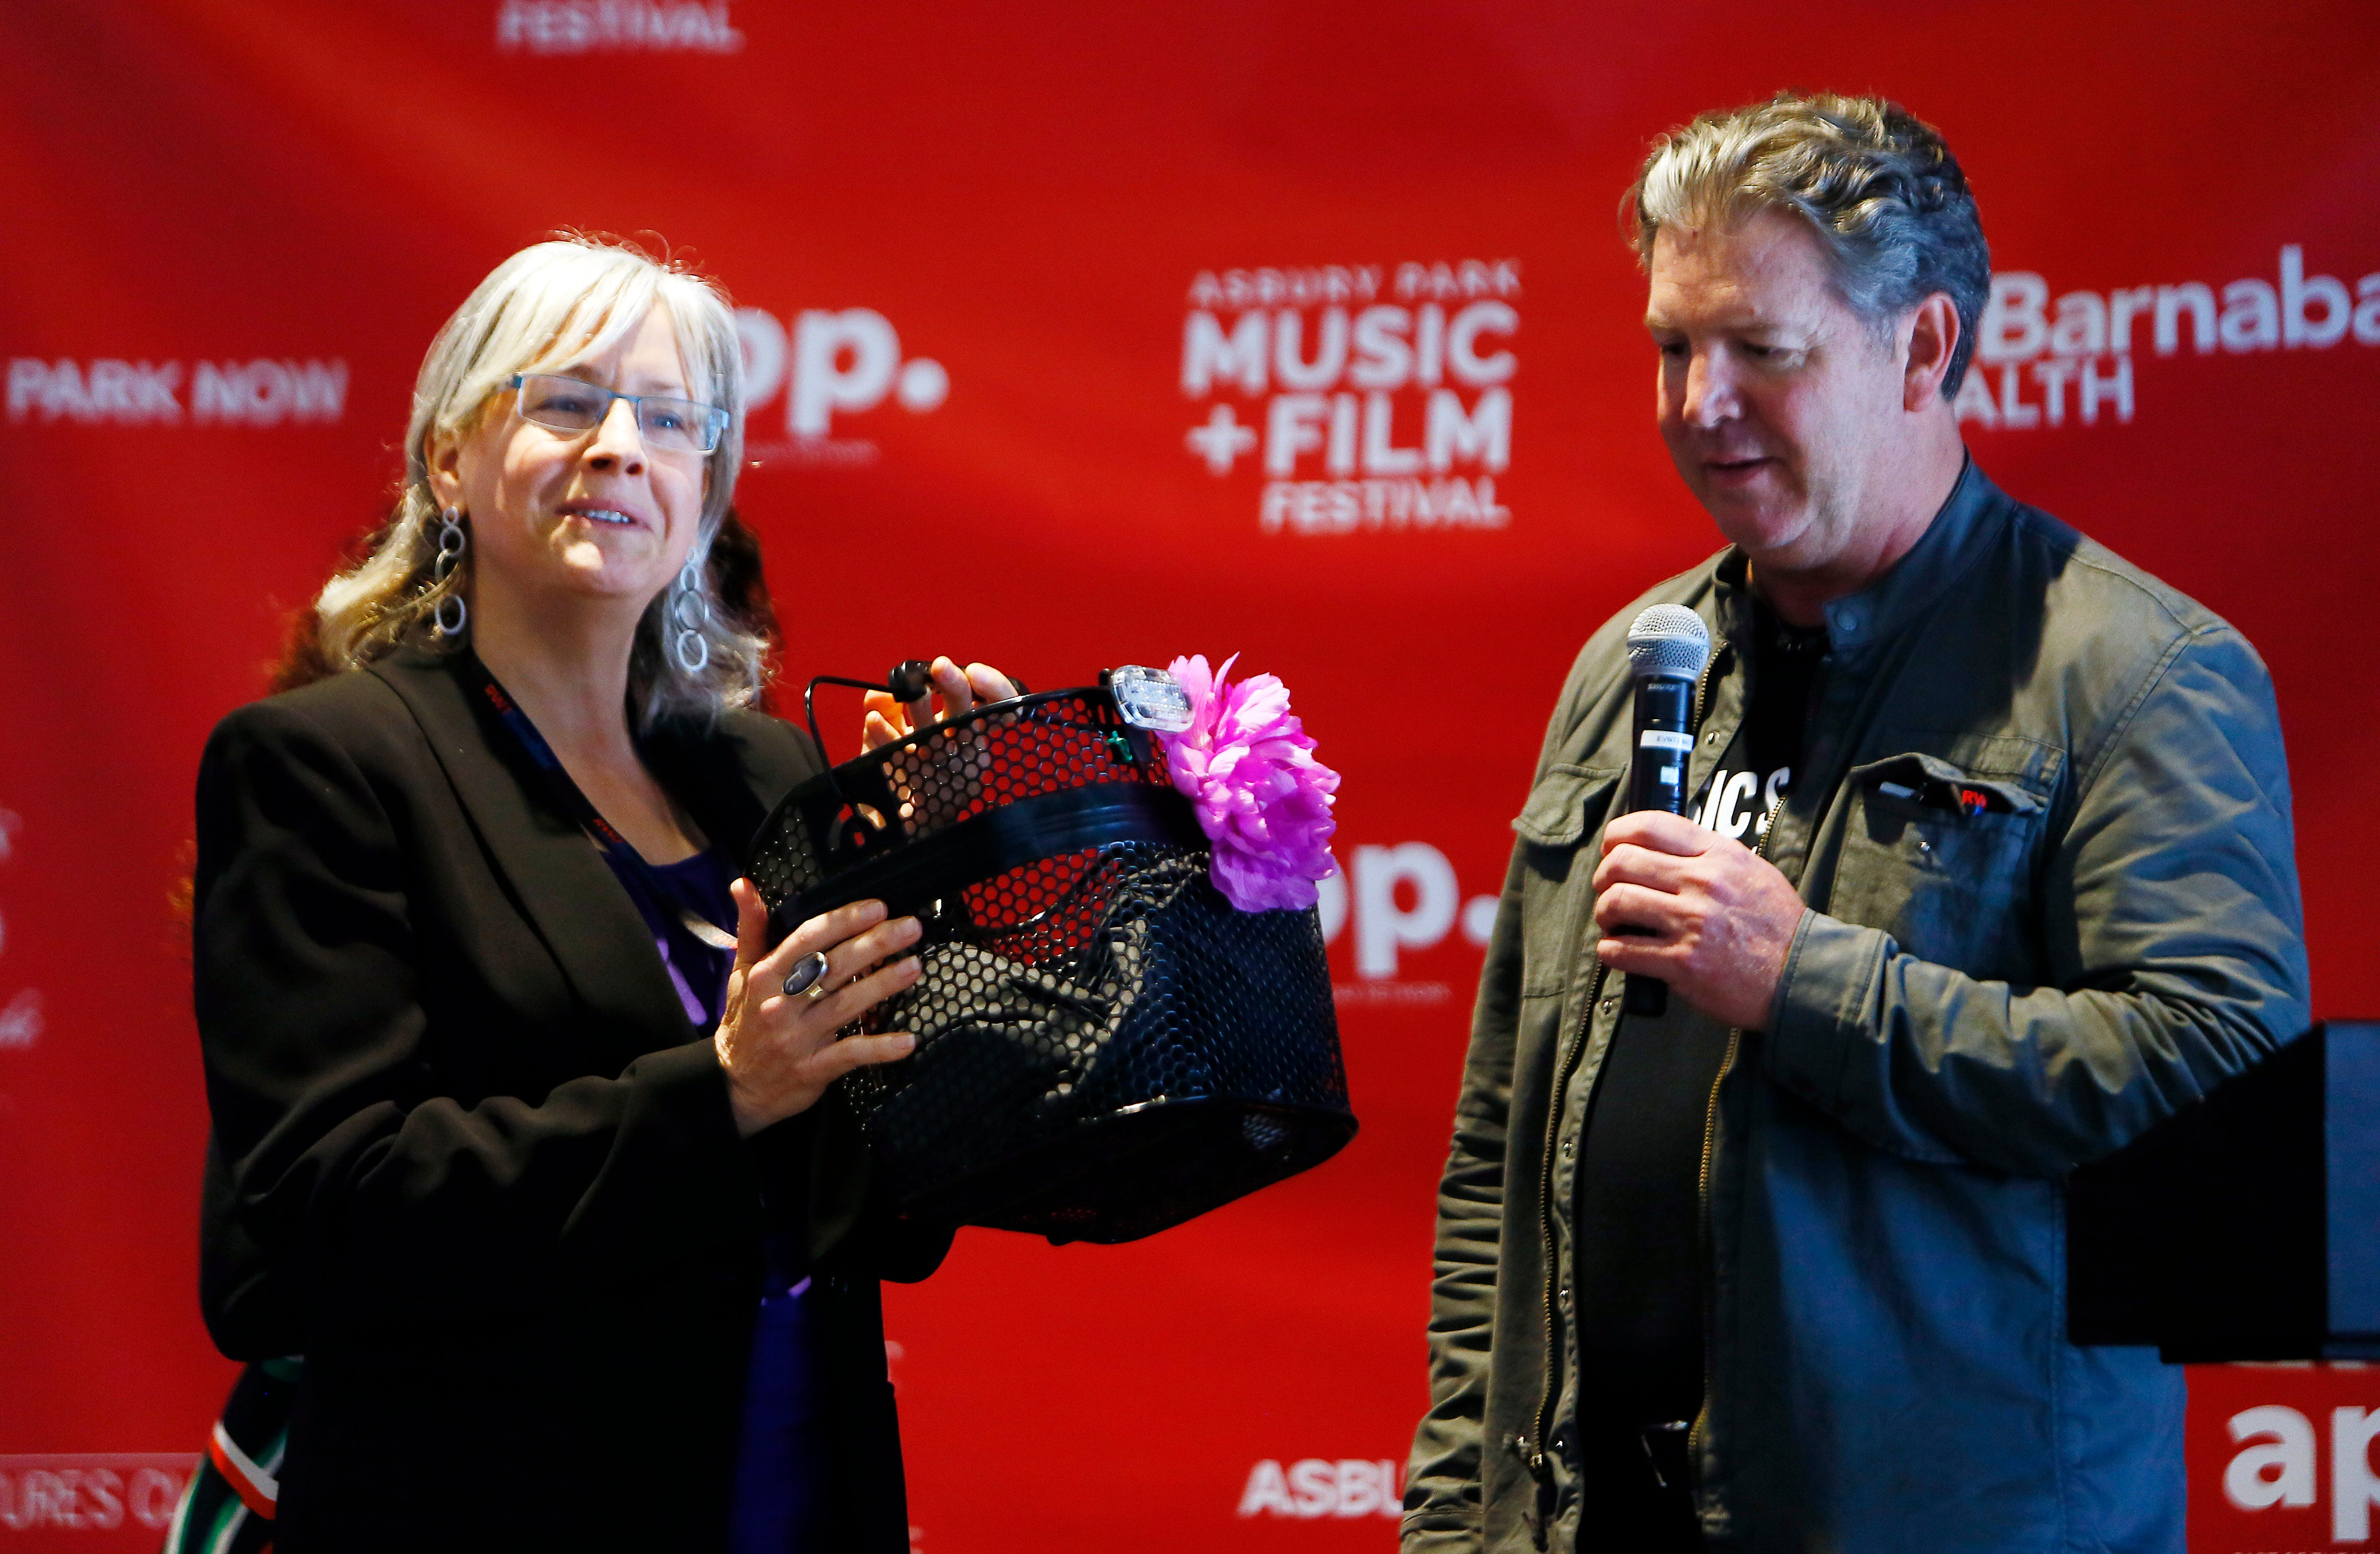 Asbury Park Music + Film Festival  sc 1 st  Asbury Park Press & Asbury Park Music and Film Festival honors Doors Michael Franti movies